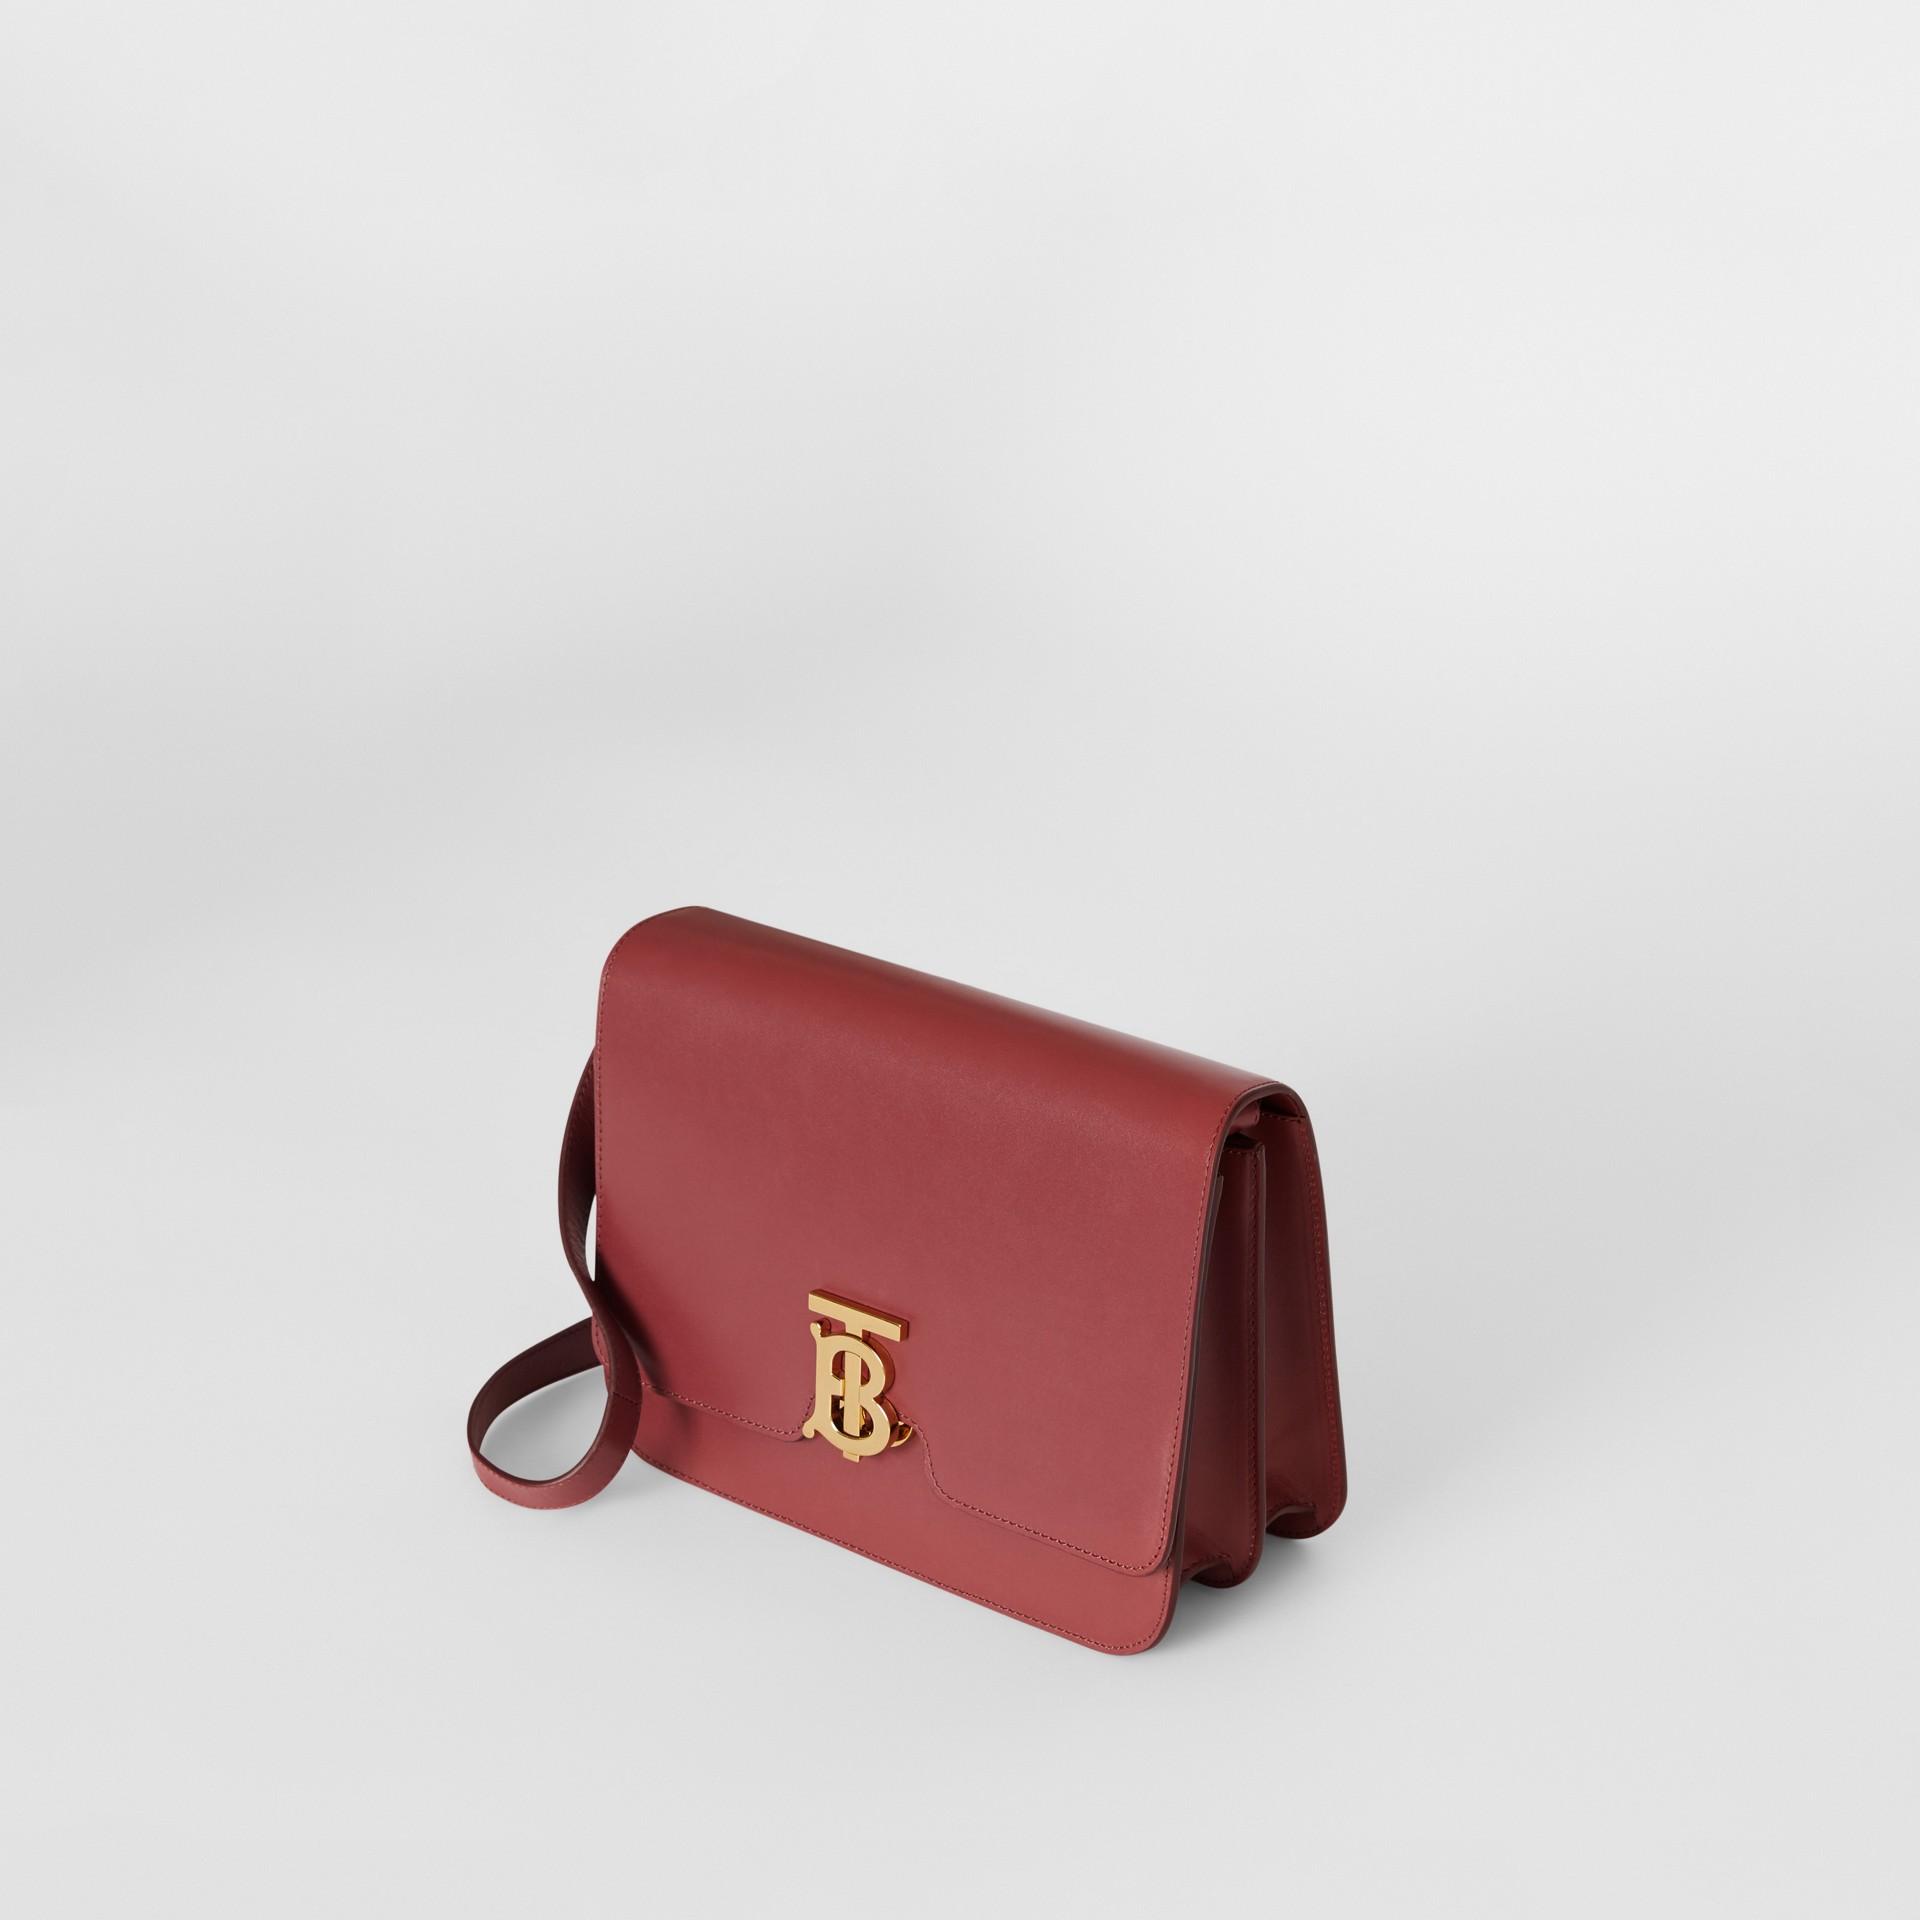 Medium Leather TB Bag in Crimson - Women   Burberry United States - gallery image 3